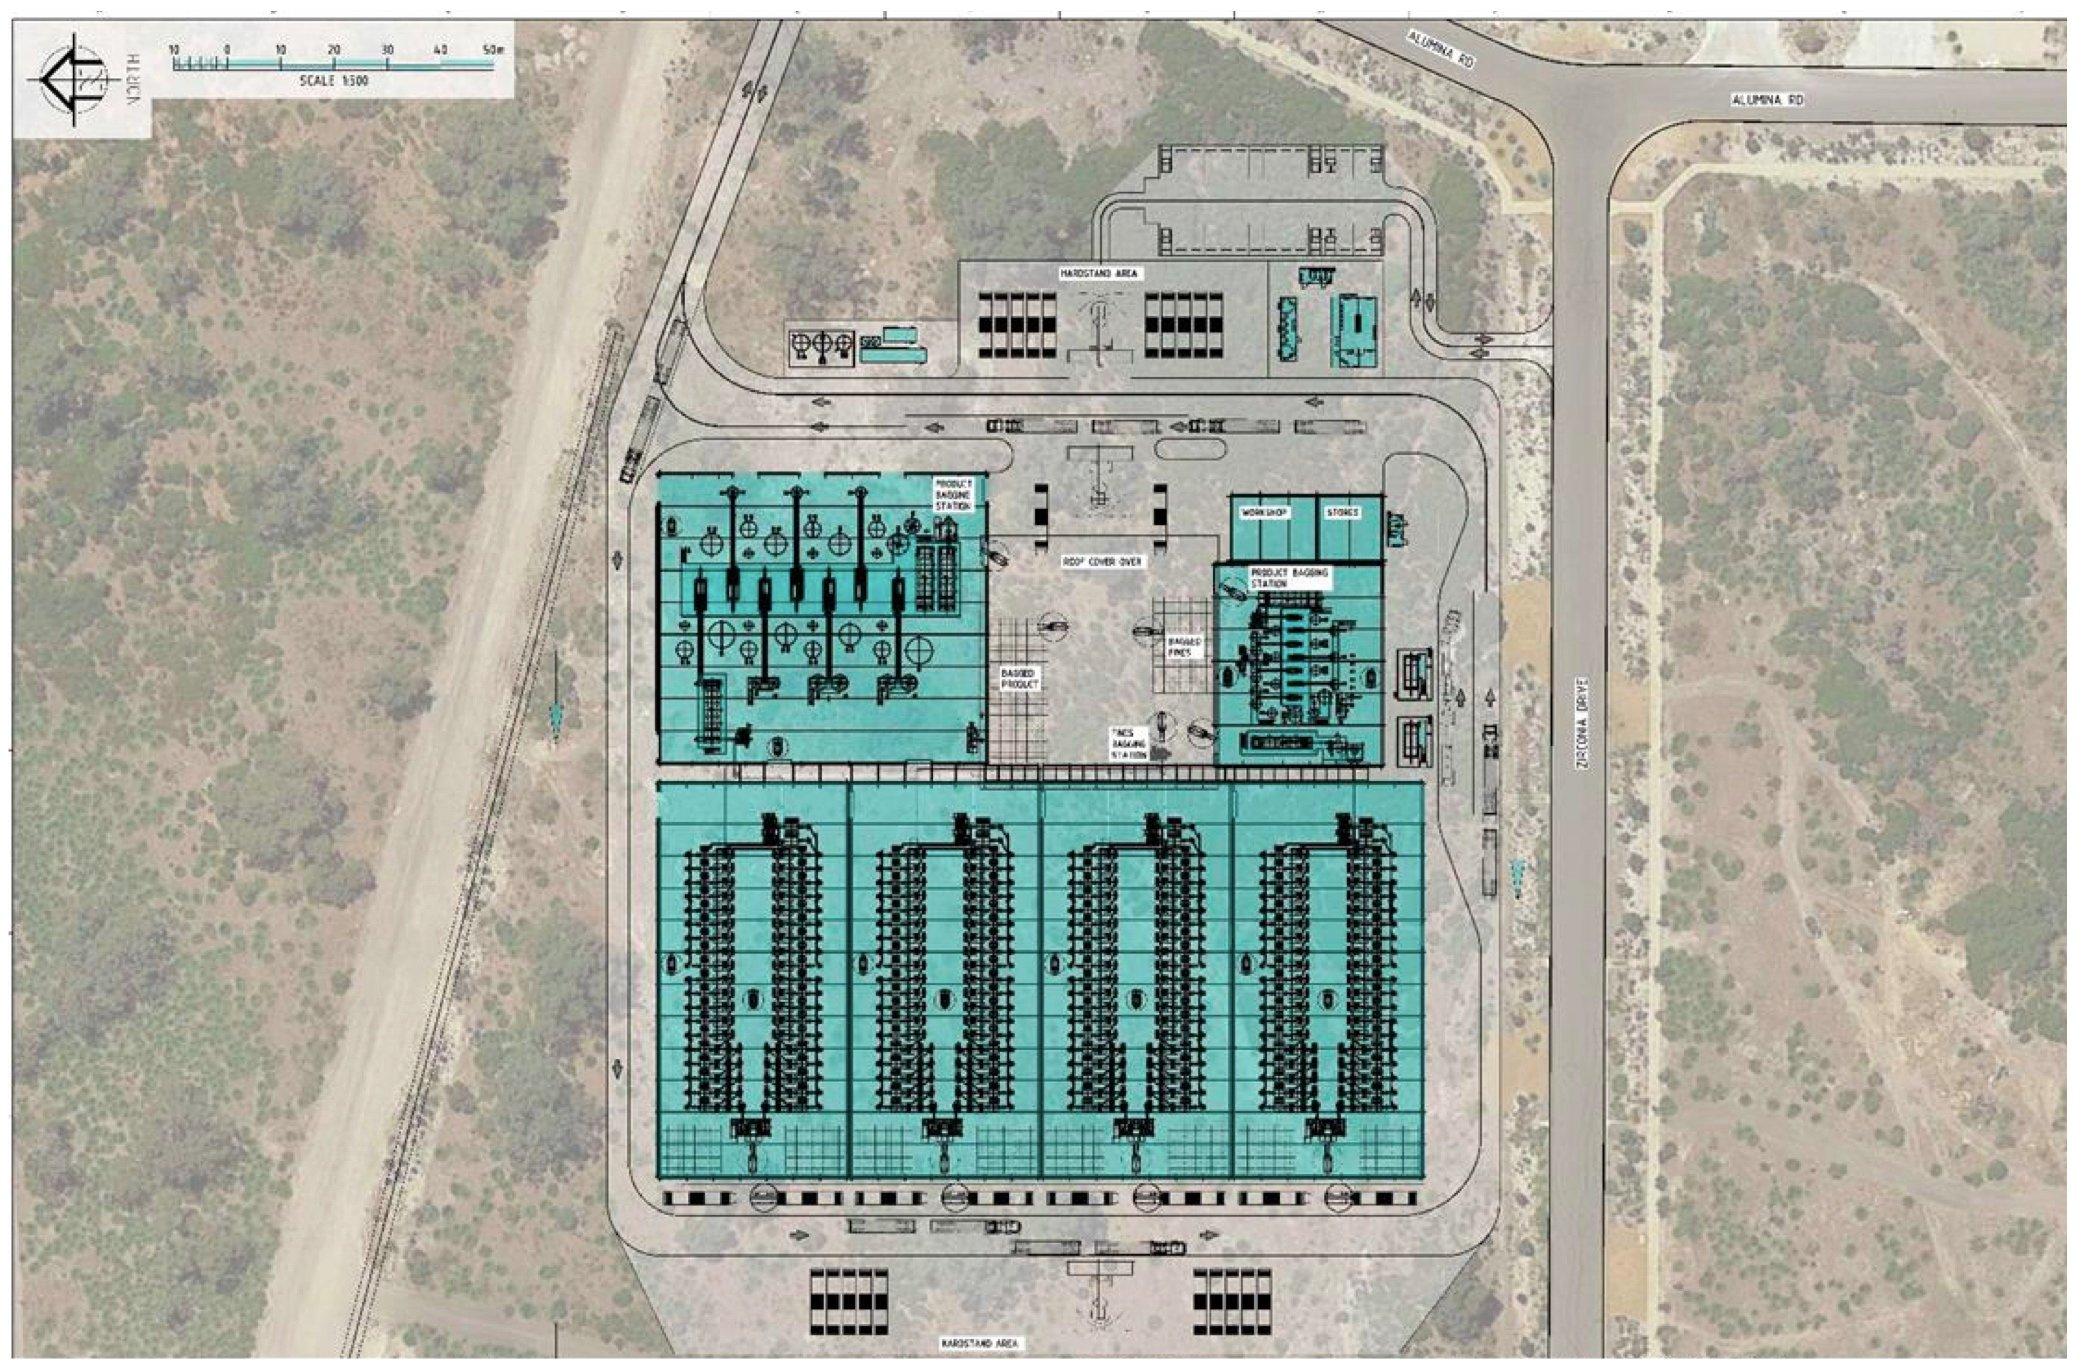 ecograf-rockingham-process-plant-layout